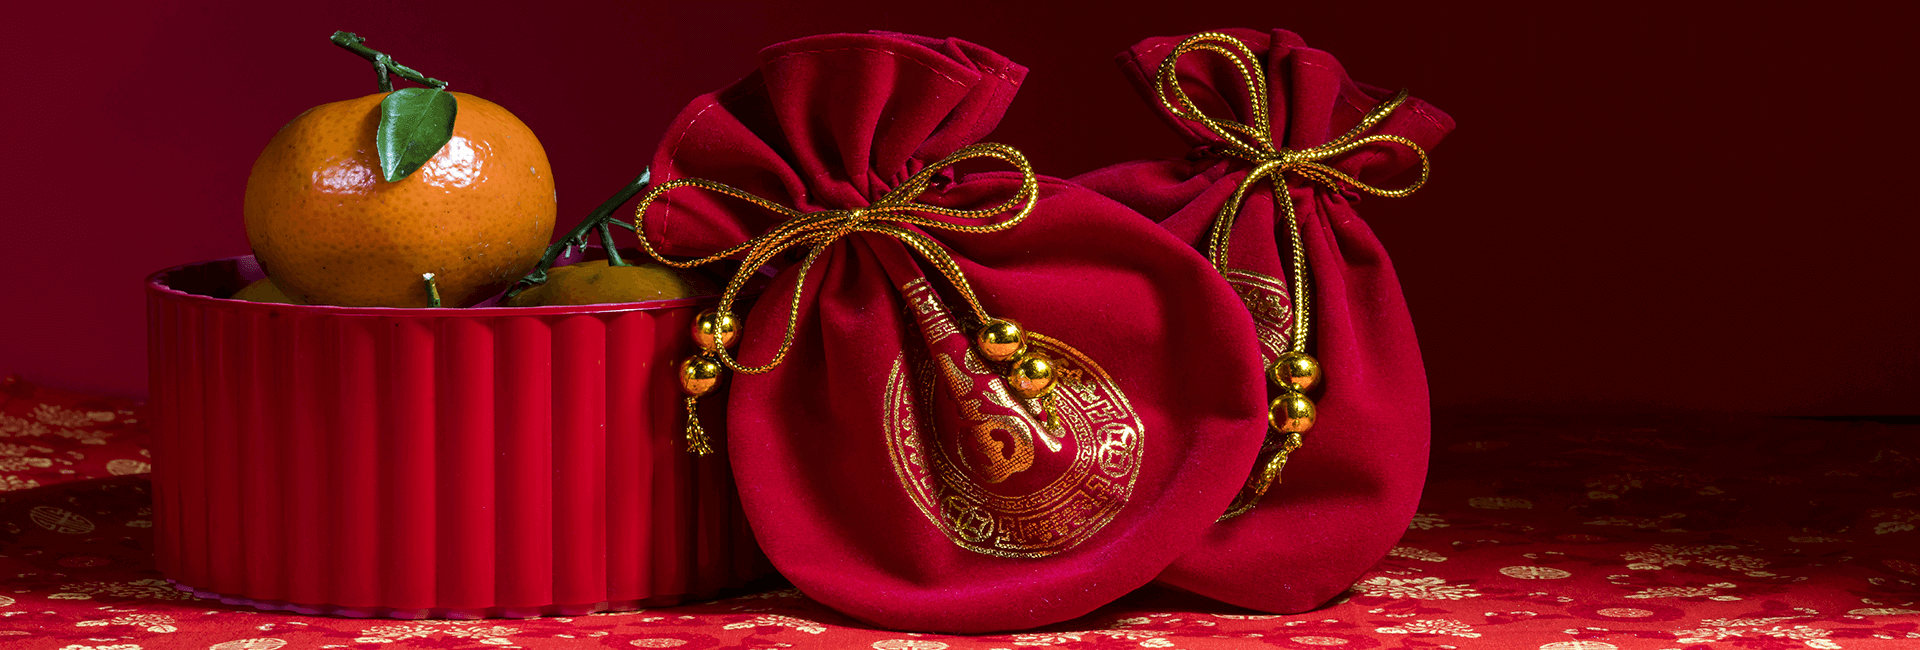 Chinese New Year Gift Baskets New York City